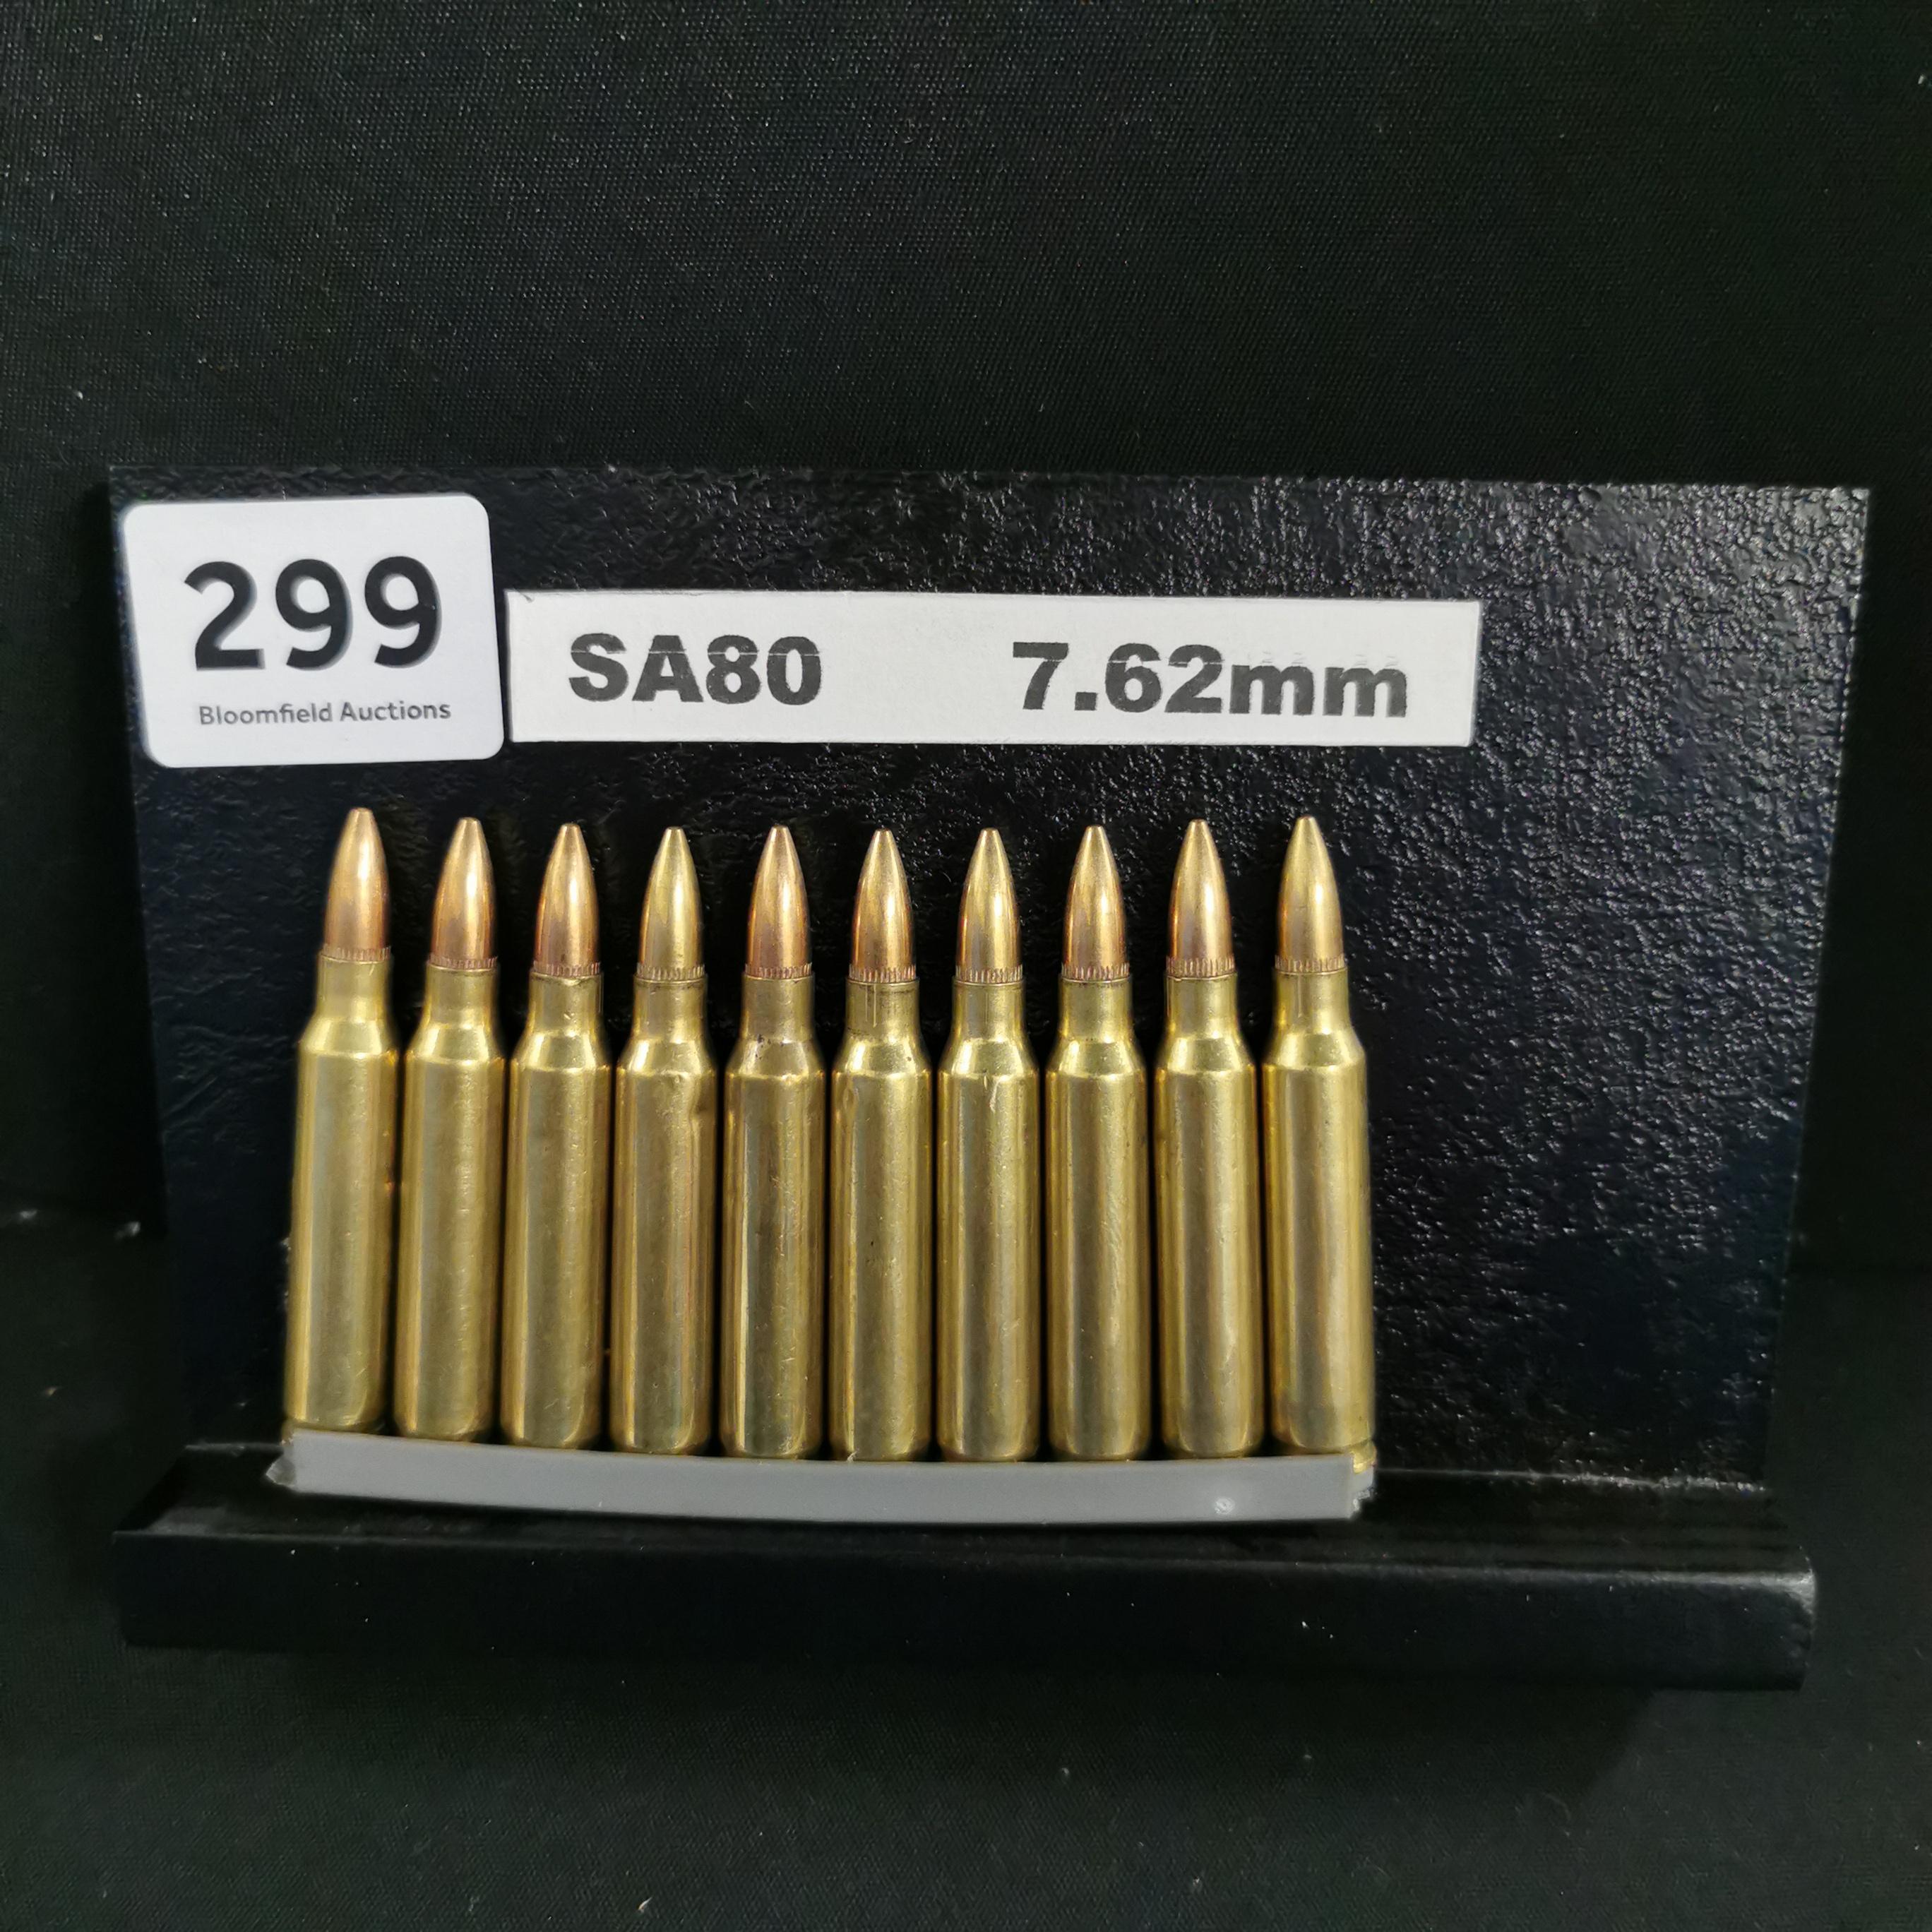 Lot 299 - SA80 INERT ANNUNITION CLIP